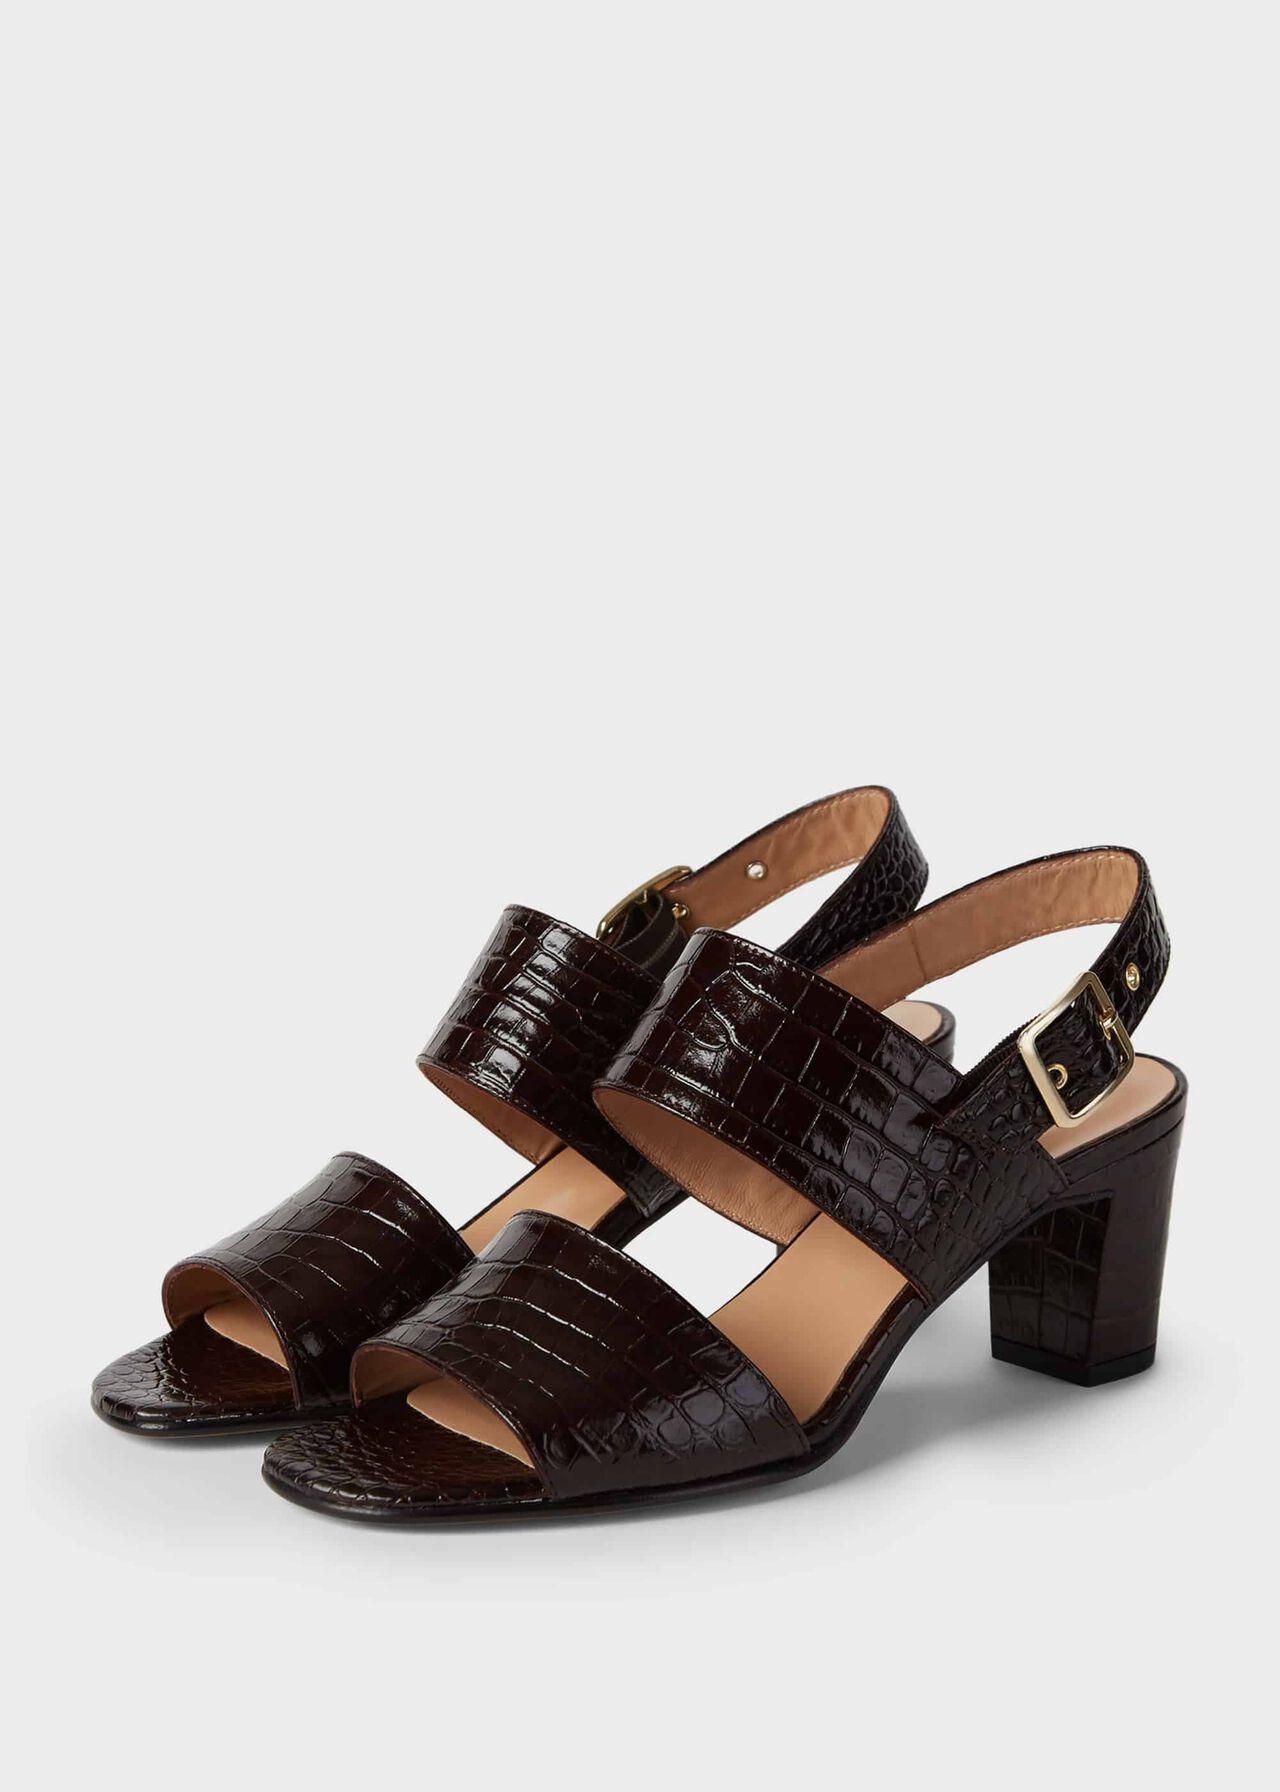 Katrina Crocodile Block Heel Sandals Chocolate